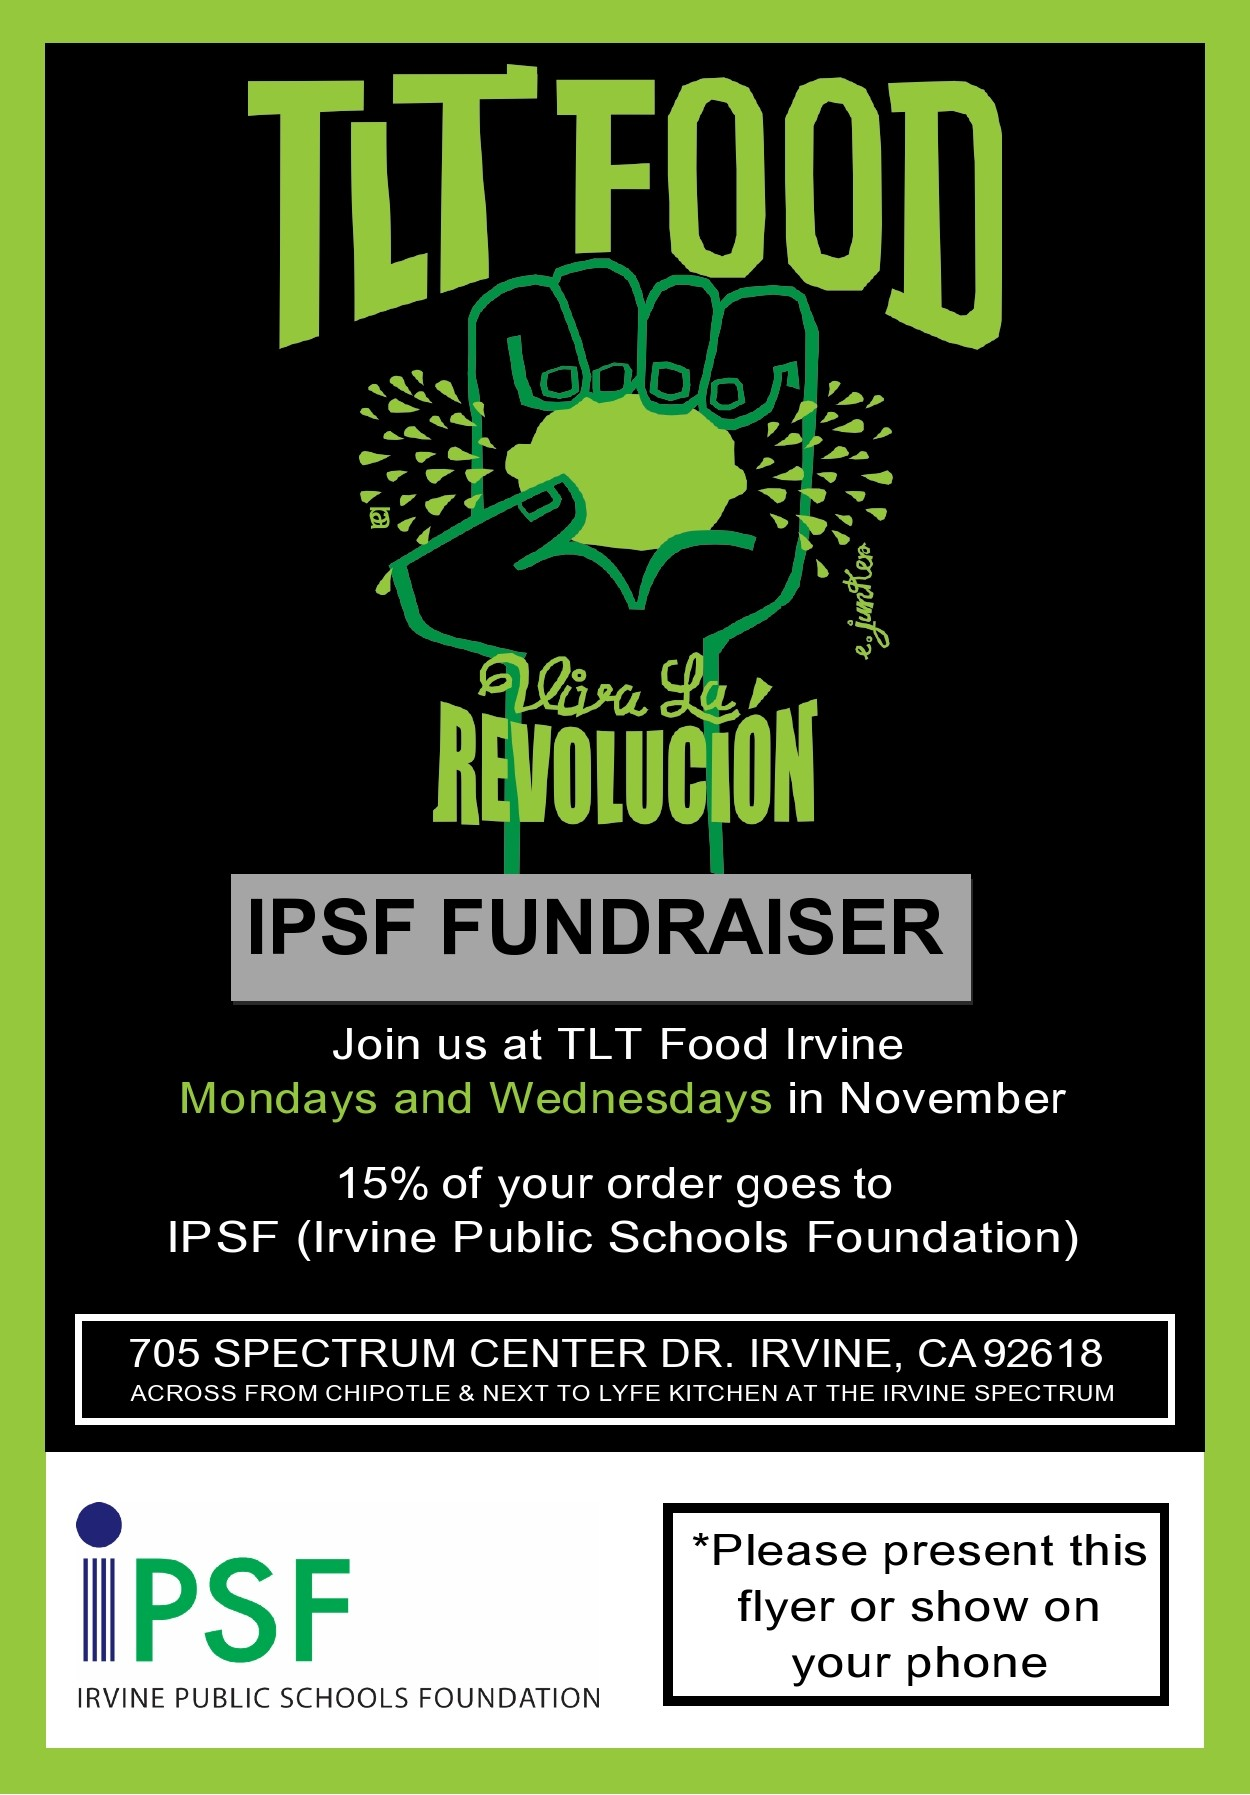 Free fundraiser flyer 08